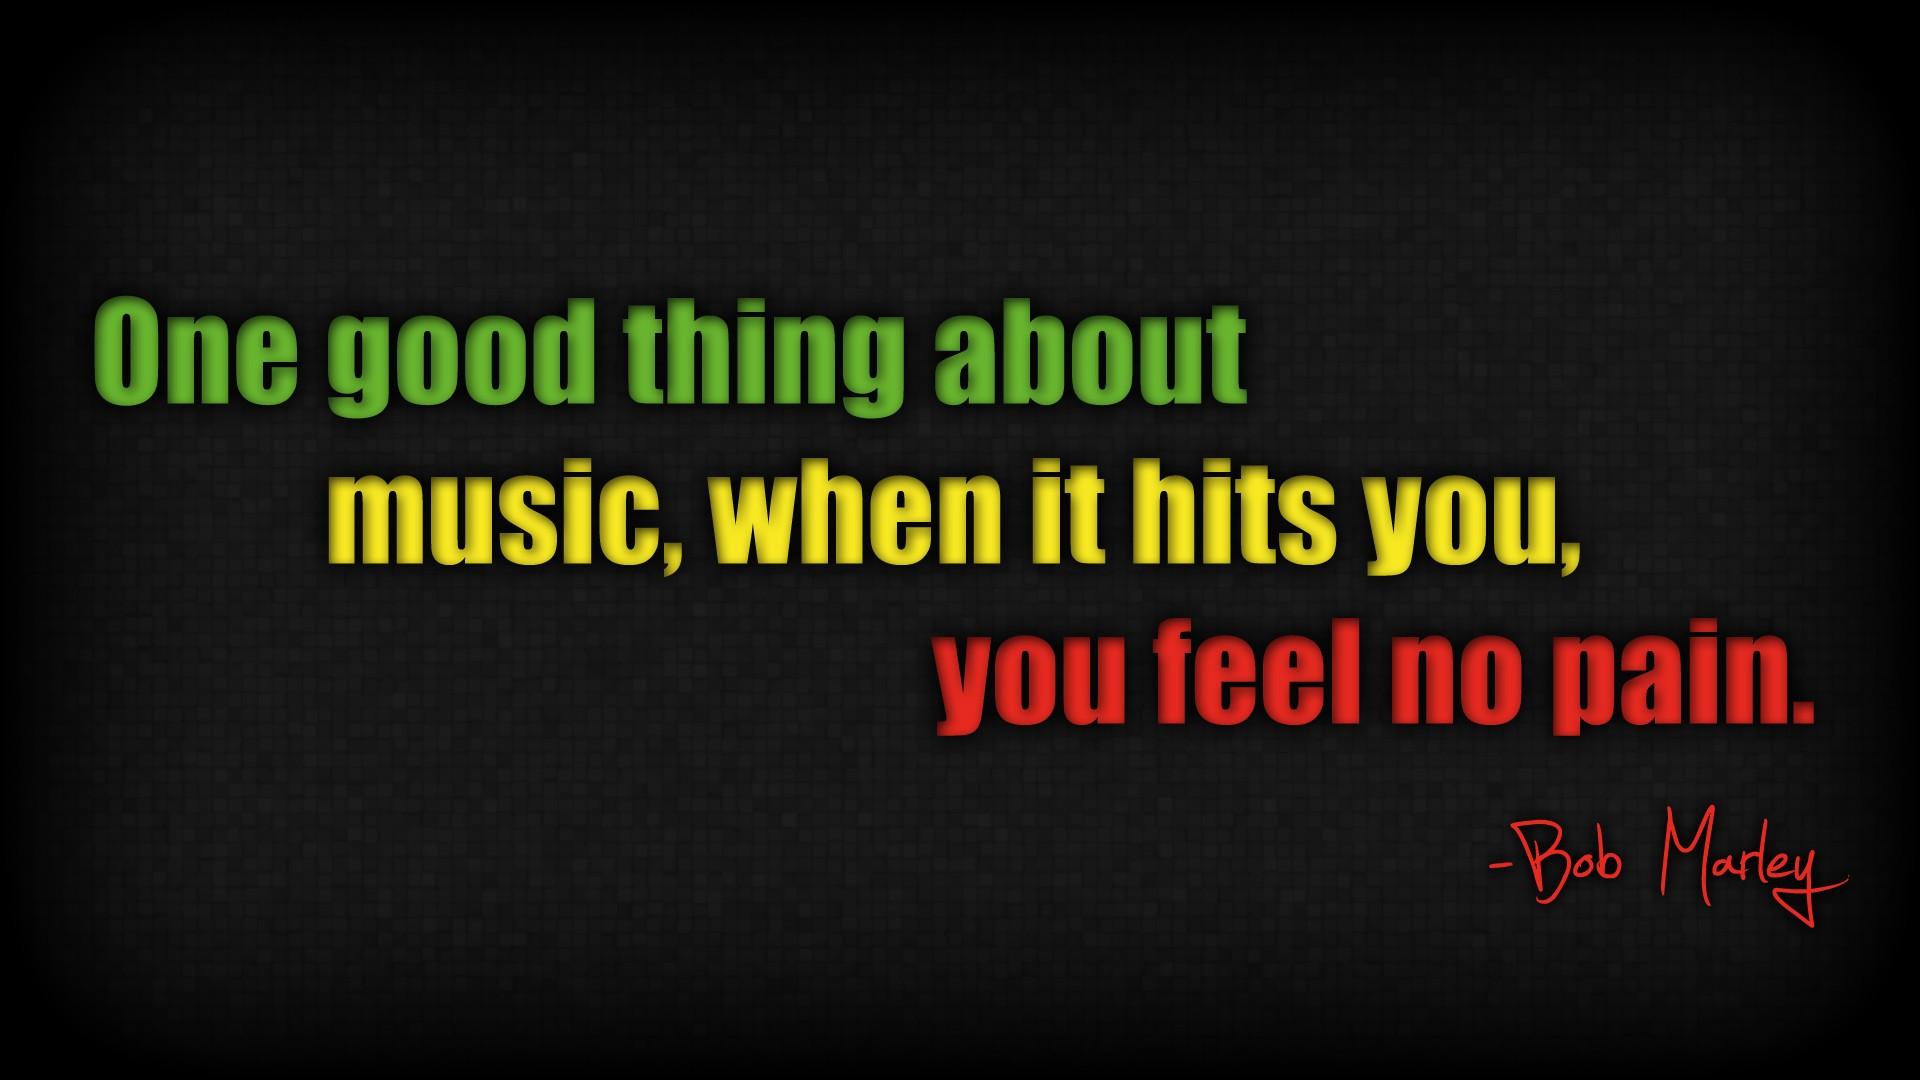 Music quote #6